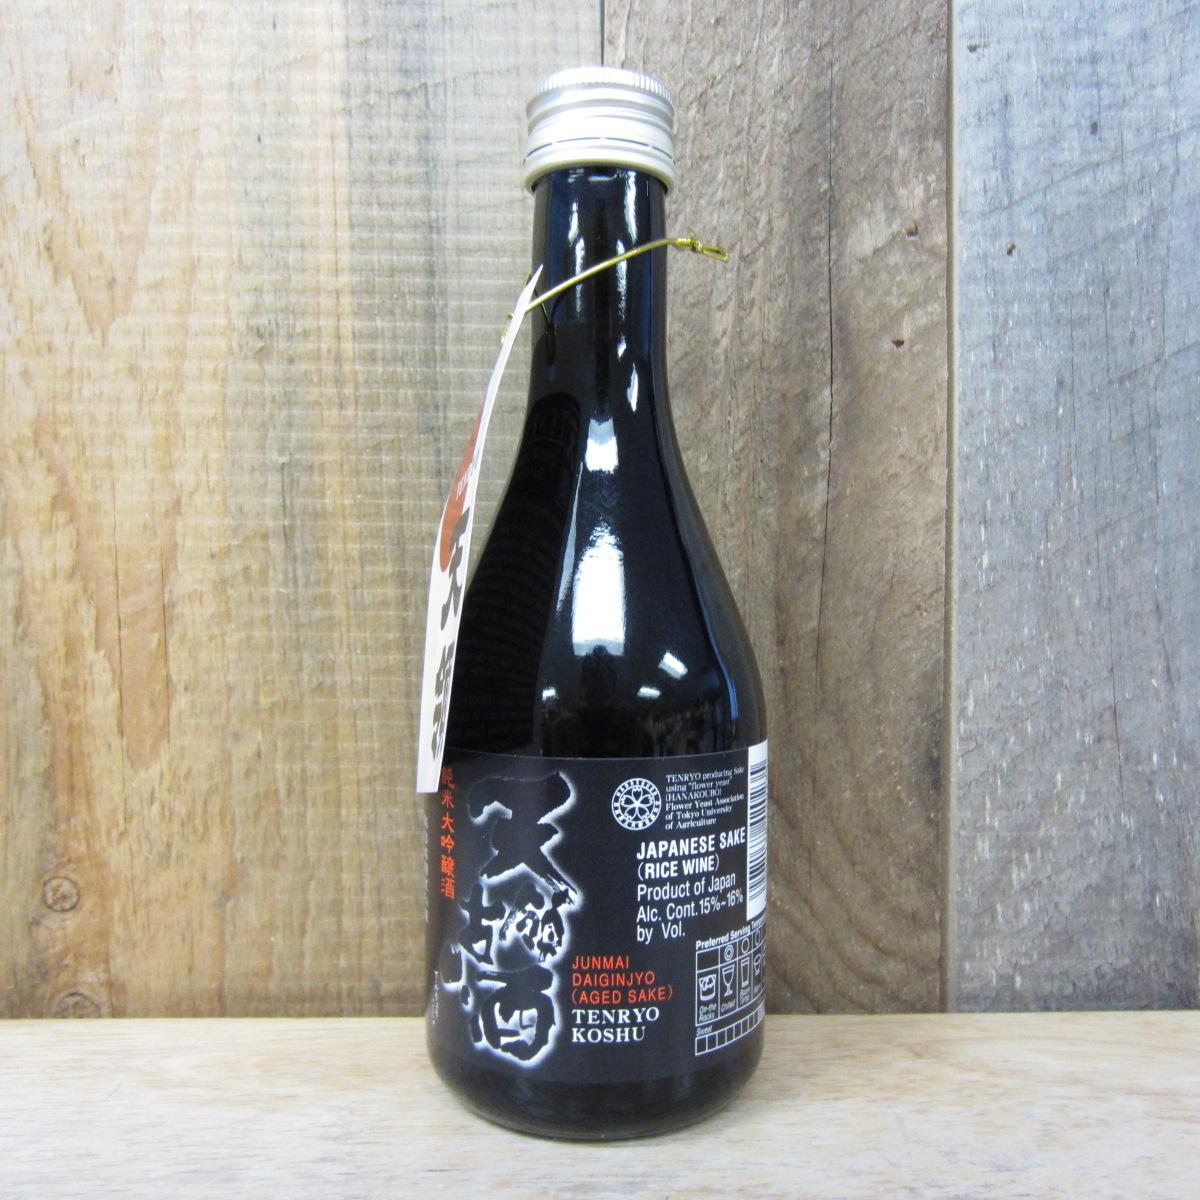 Tenryo Koshu Junmai Daiginjo Aged Sake 300ml